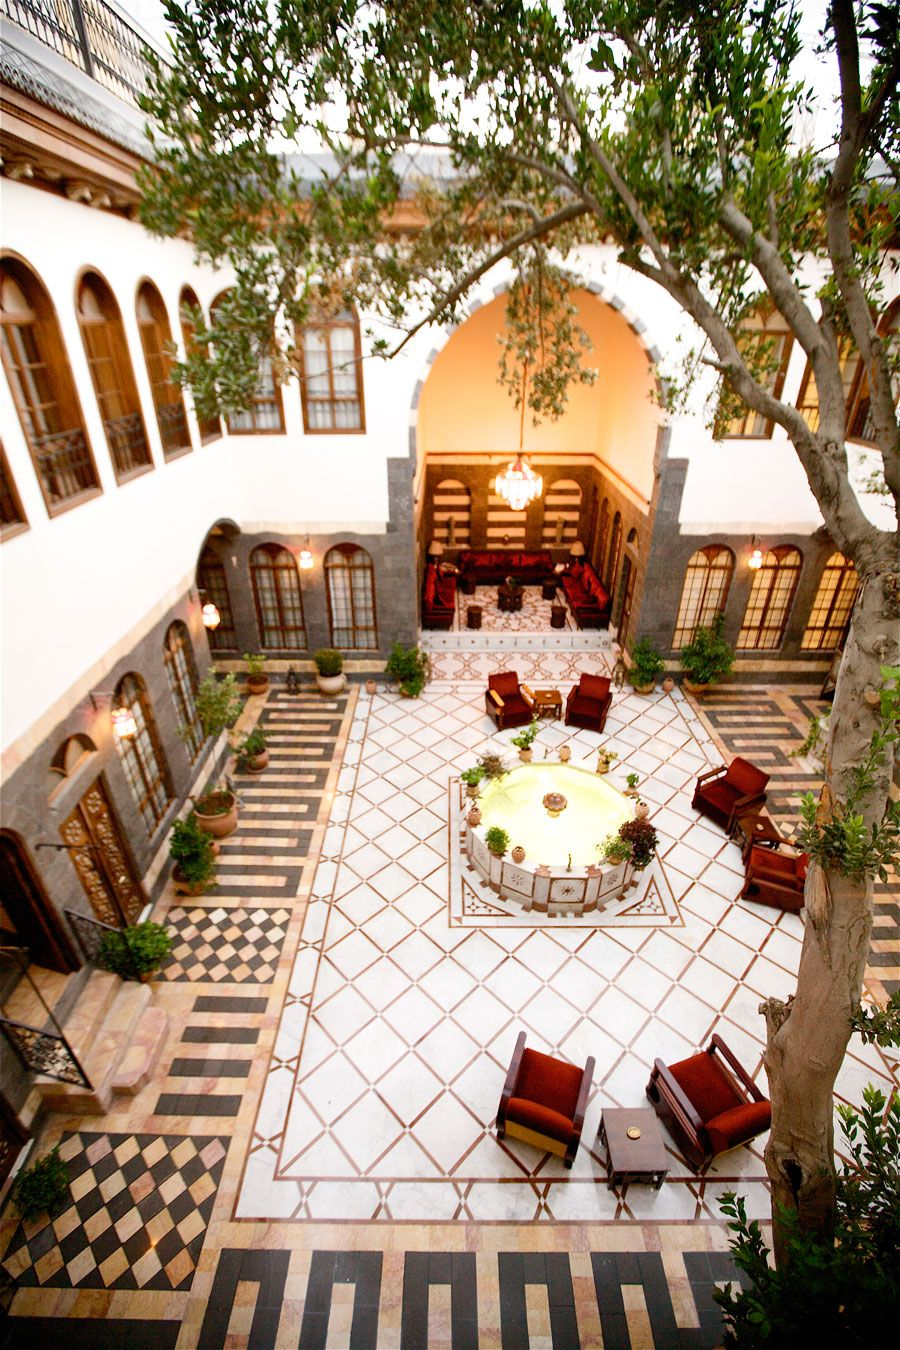 courtyard beit zafran hotel de charme damascus syria. Black Bedroom Furniture Sets. Home Design Ideas